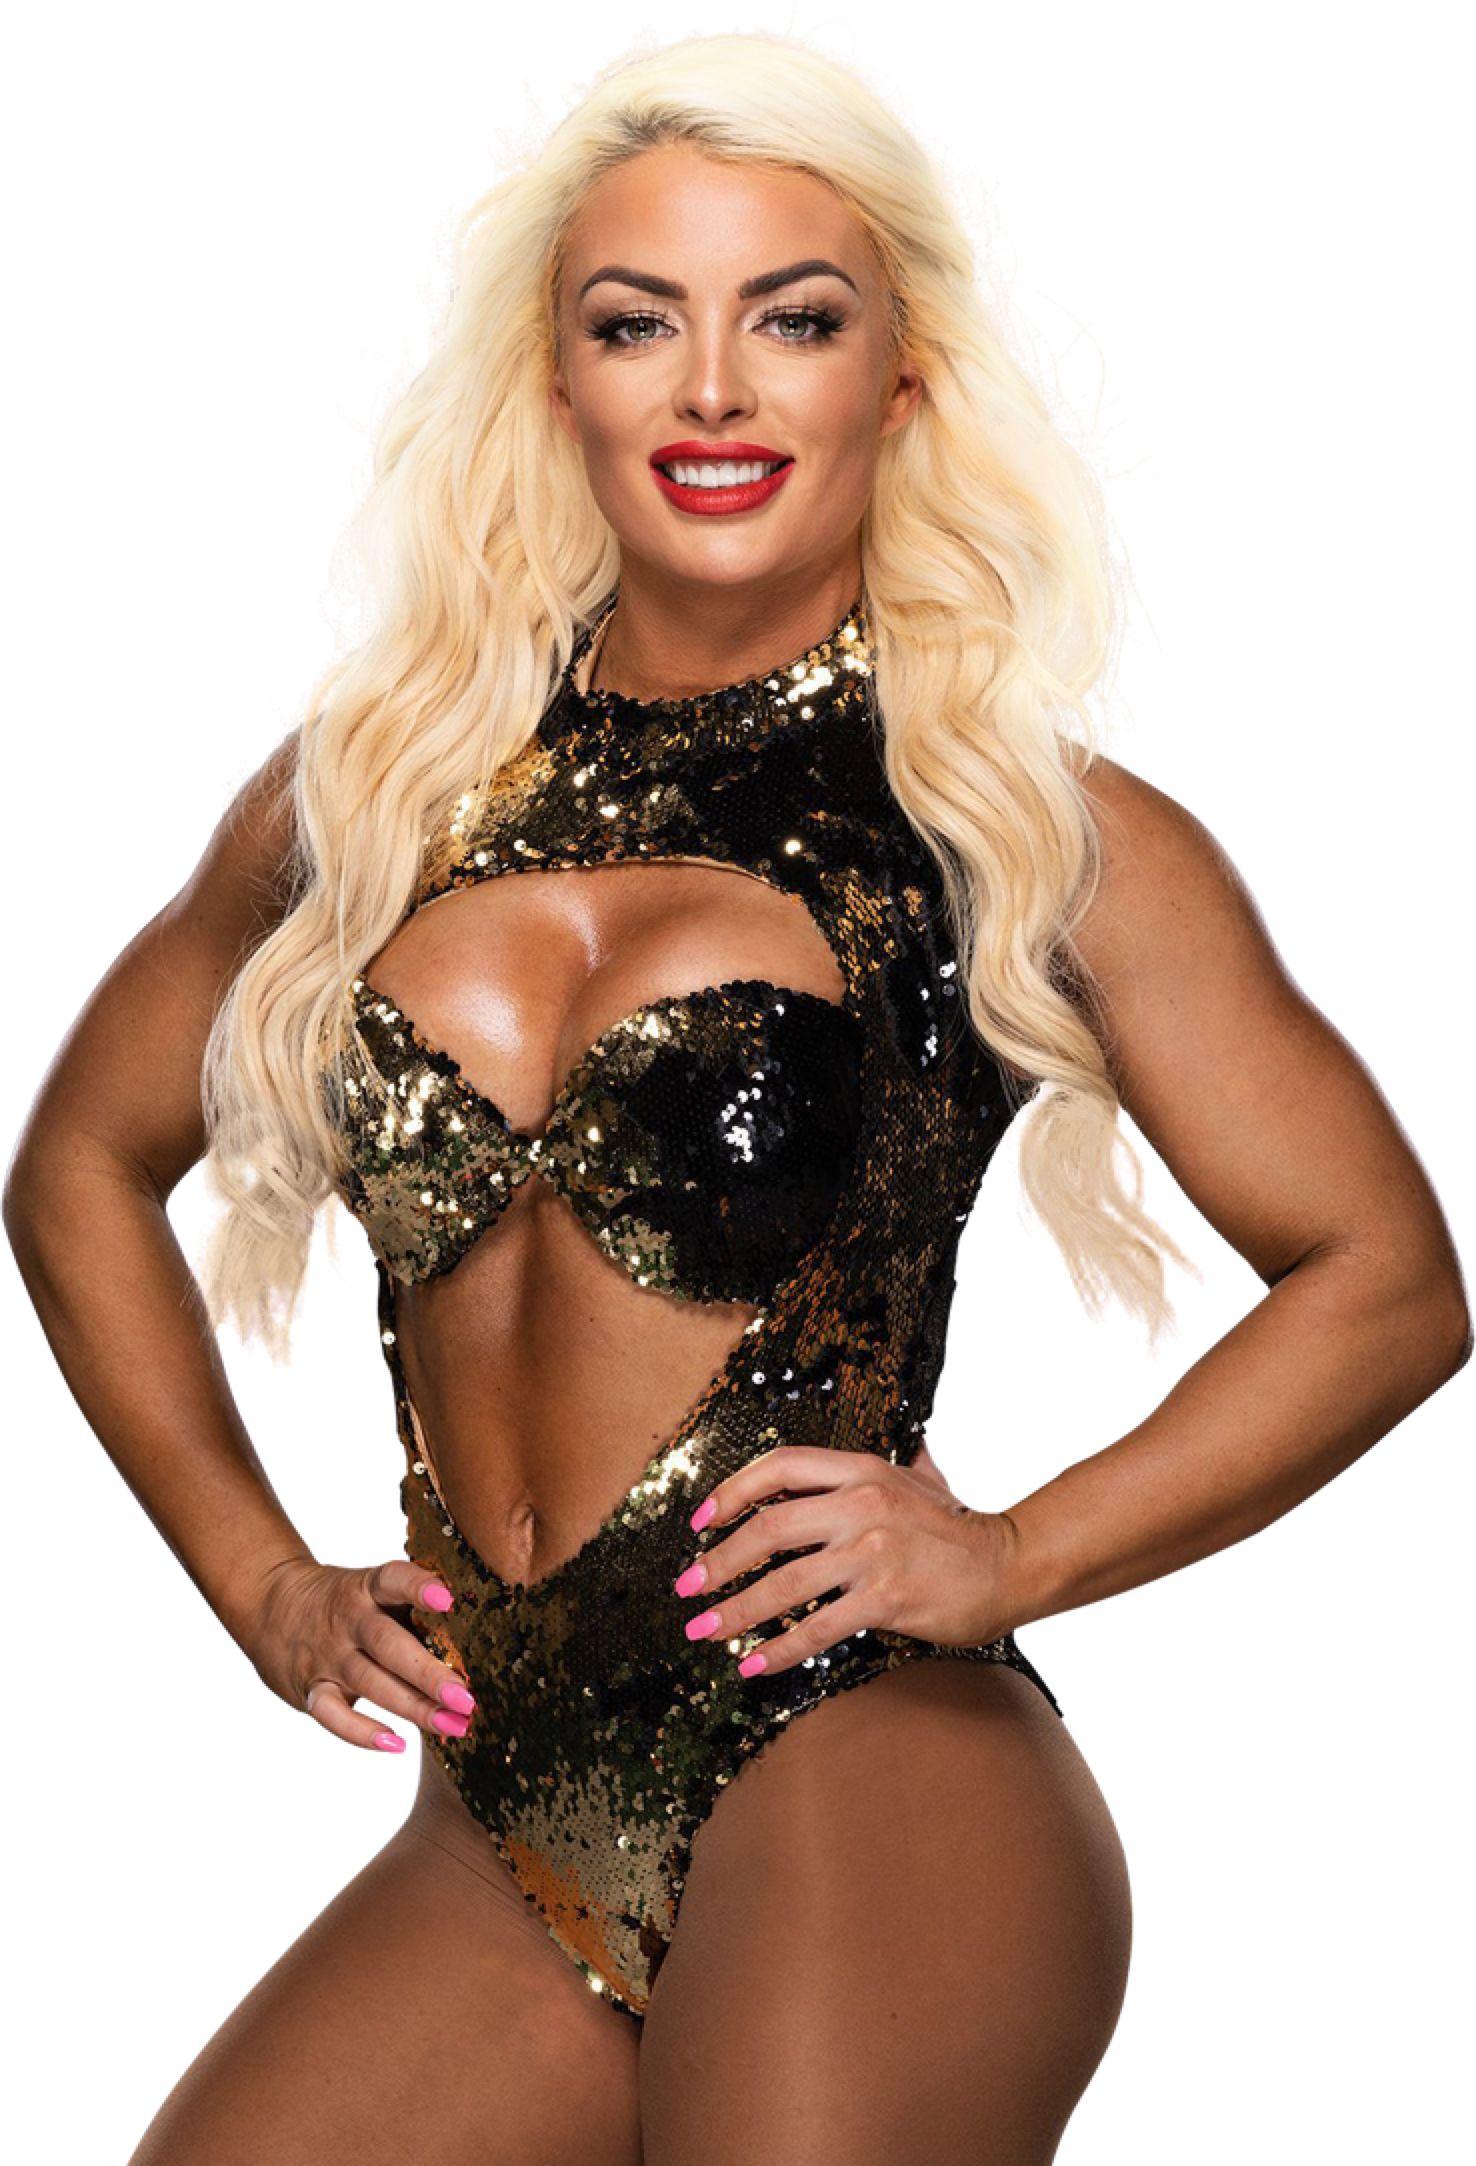 Mandy Rose Royal Rumble 2020 Png By Ambriegnsasylum16 On Deviantart